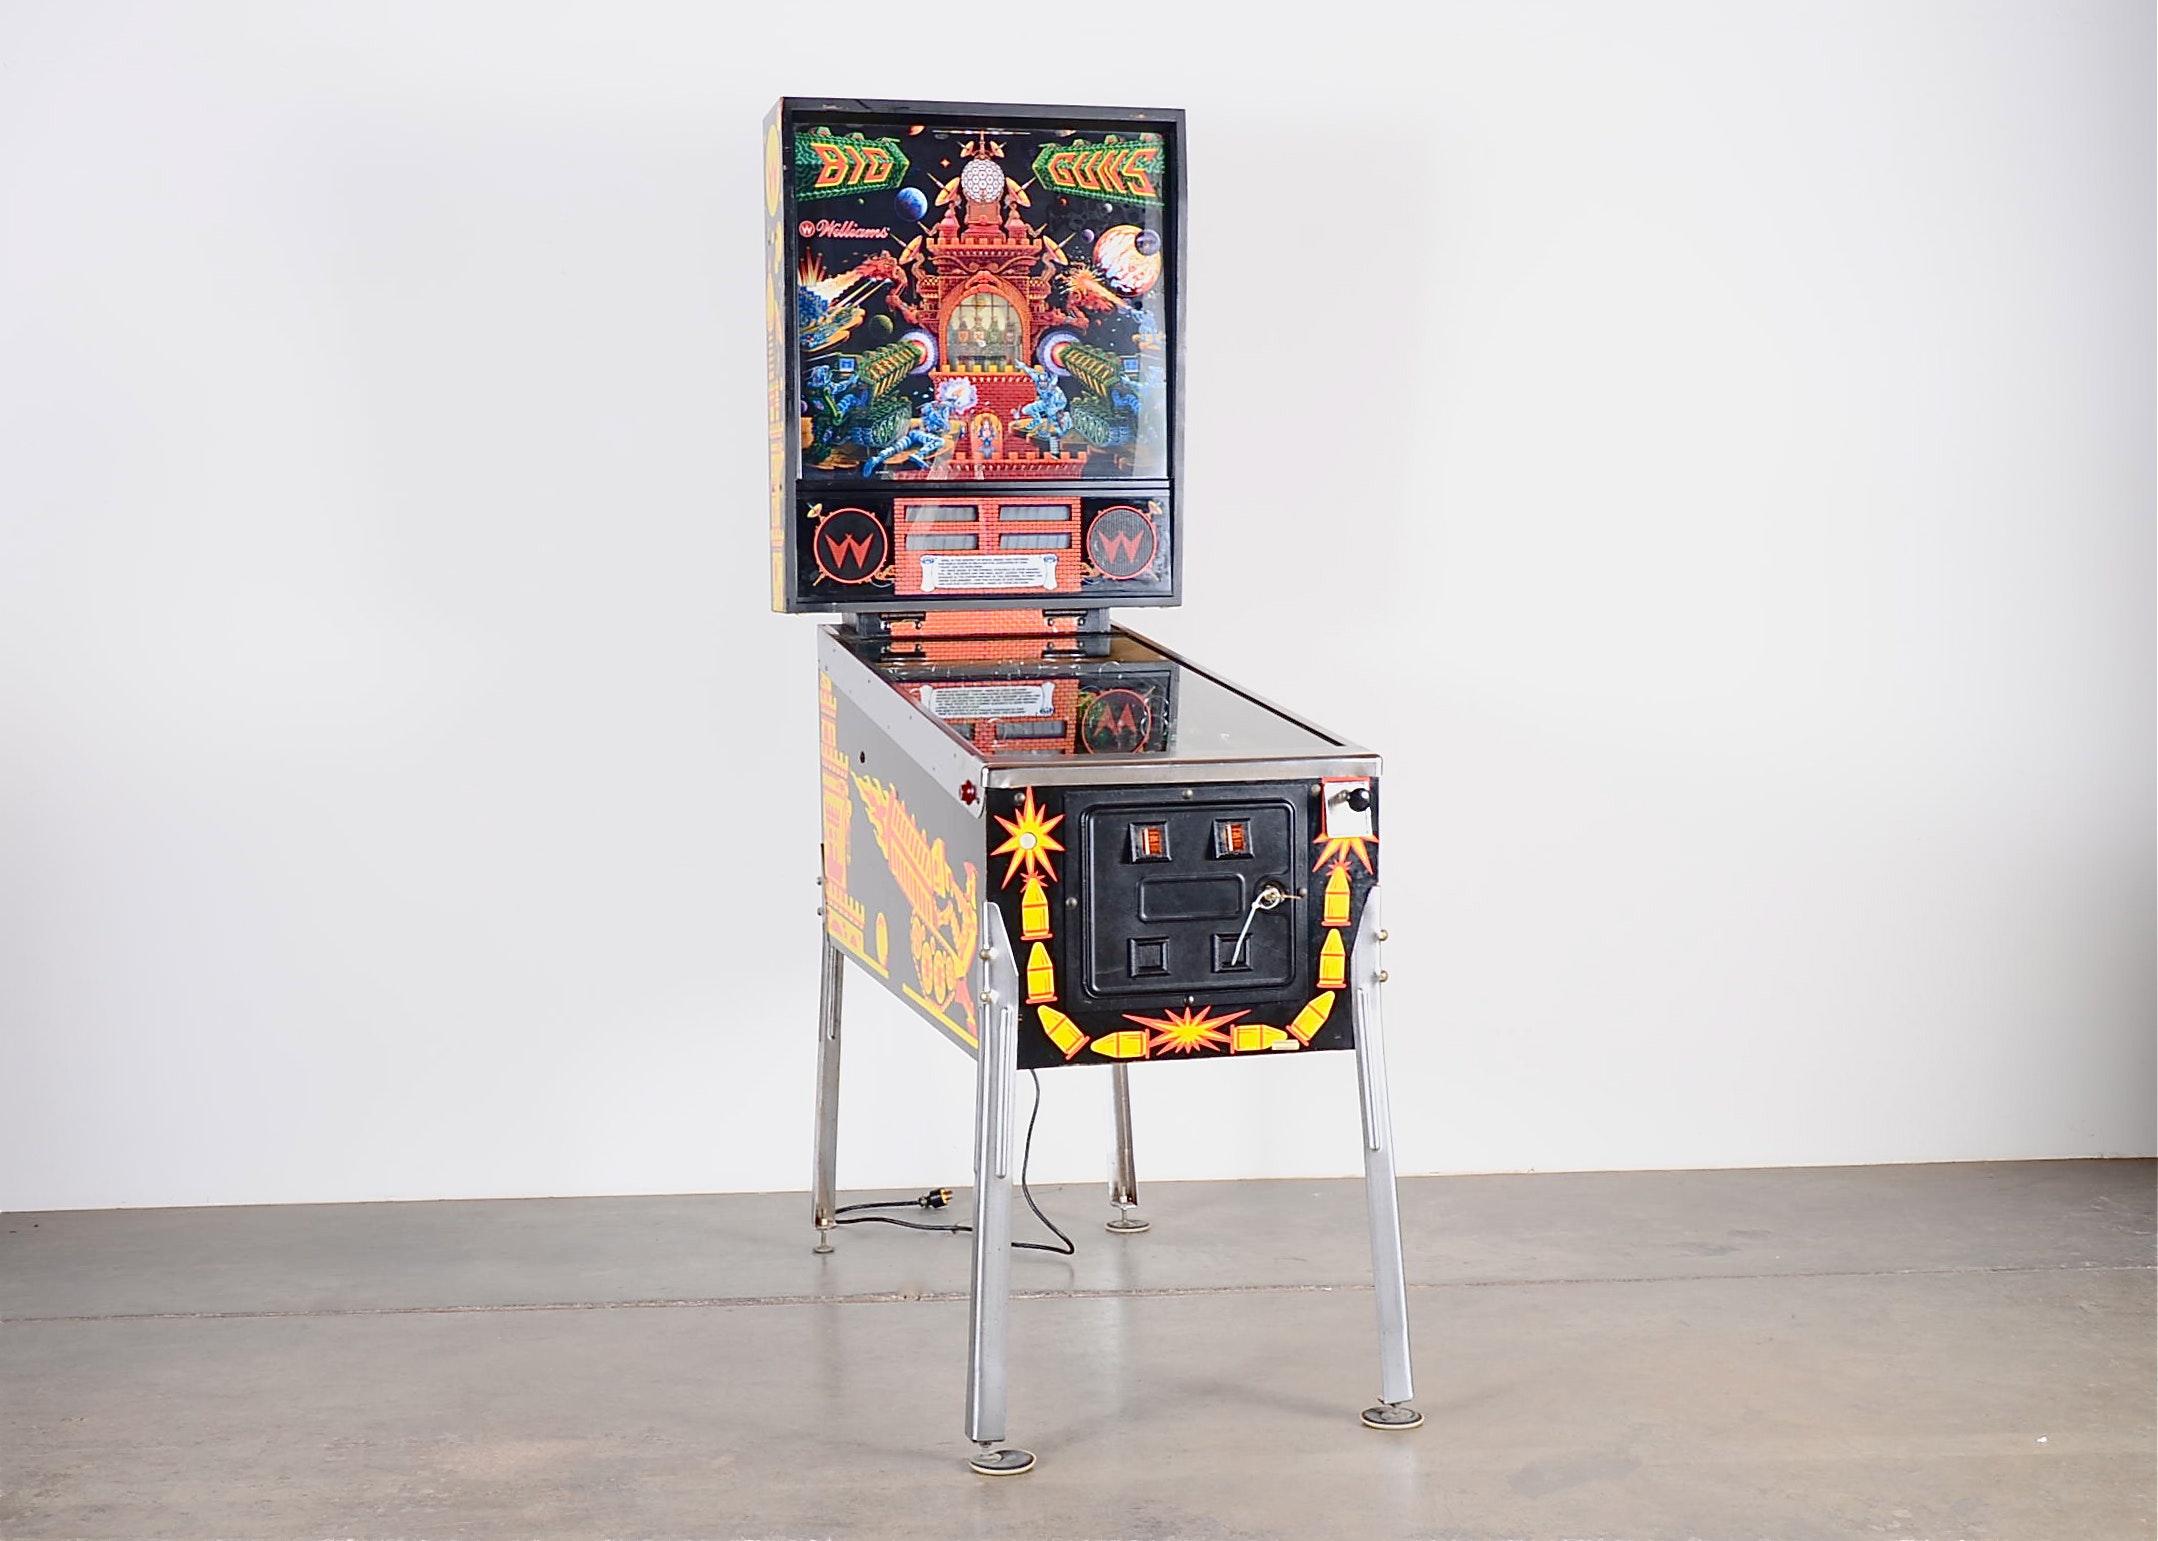 Big Guns Pinball Game by Williams